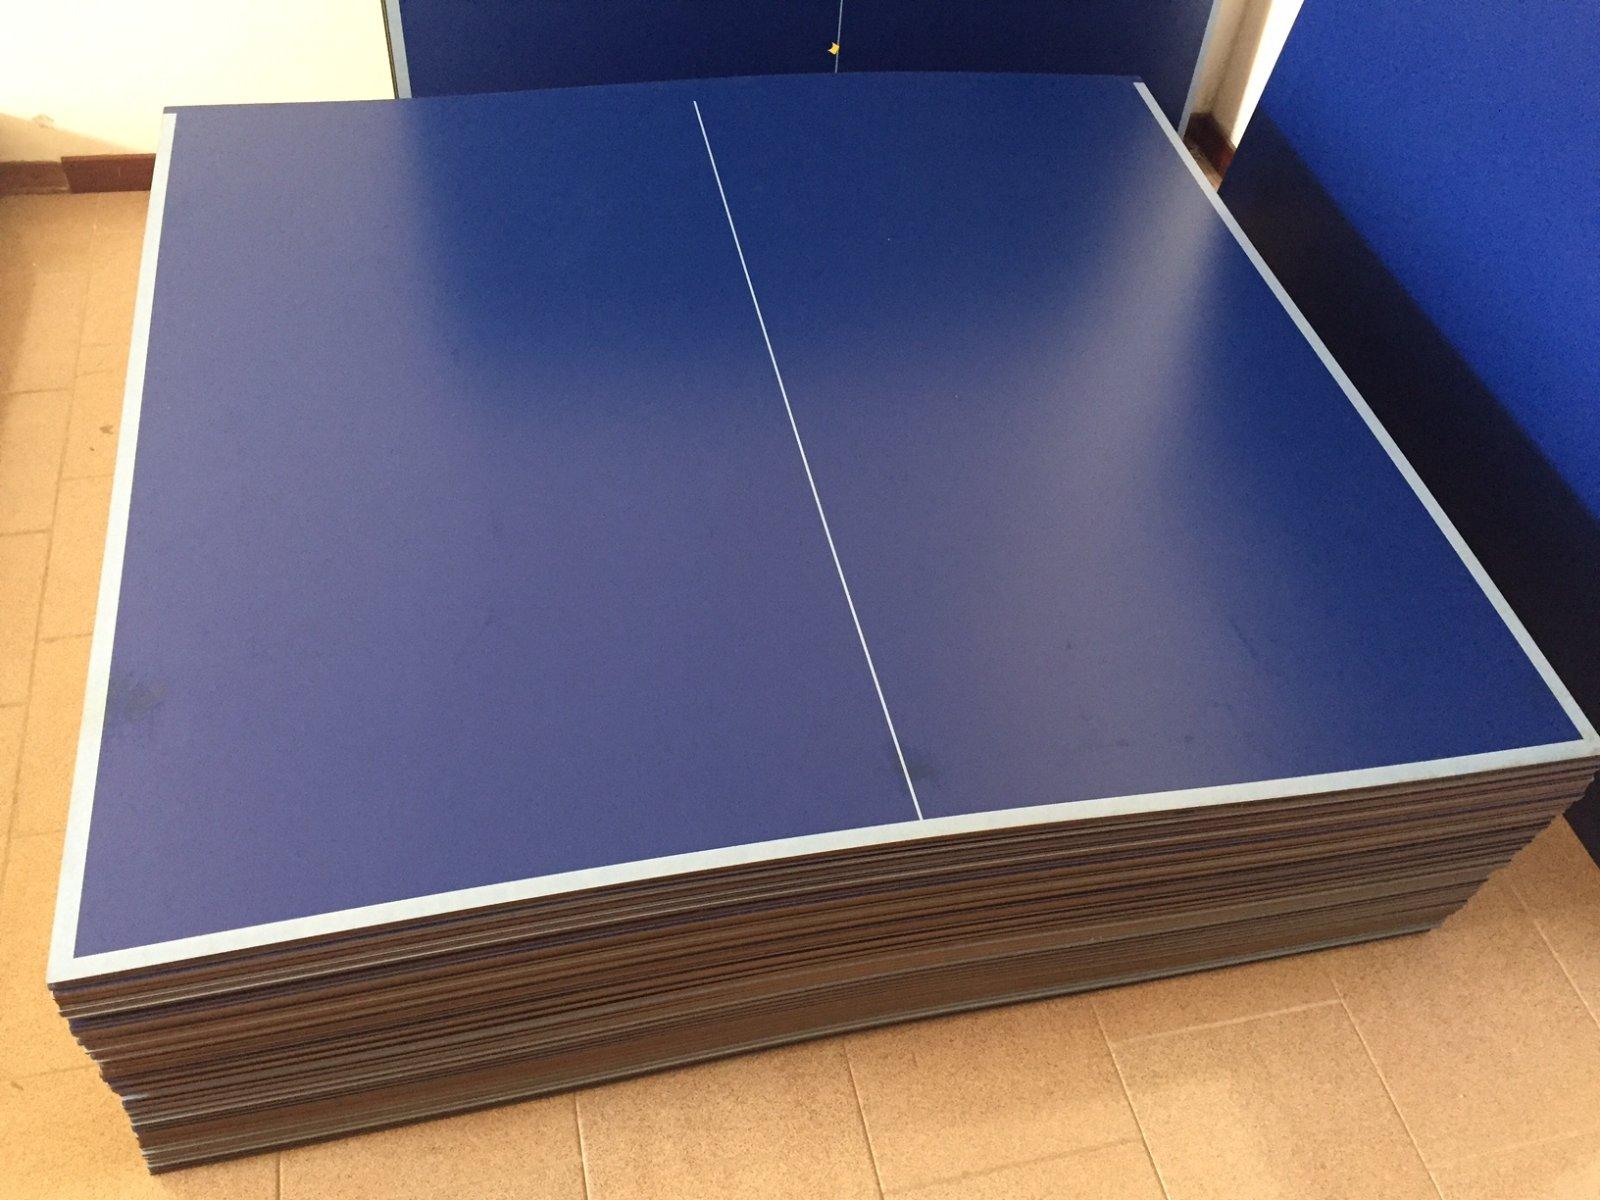 Coppia basi piani pannelli 3 scelta tavolo ping pong for Materiale tavolo ping pong